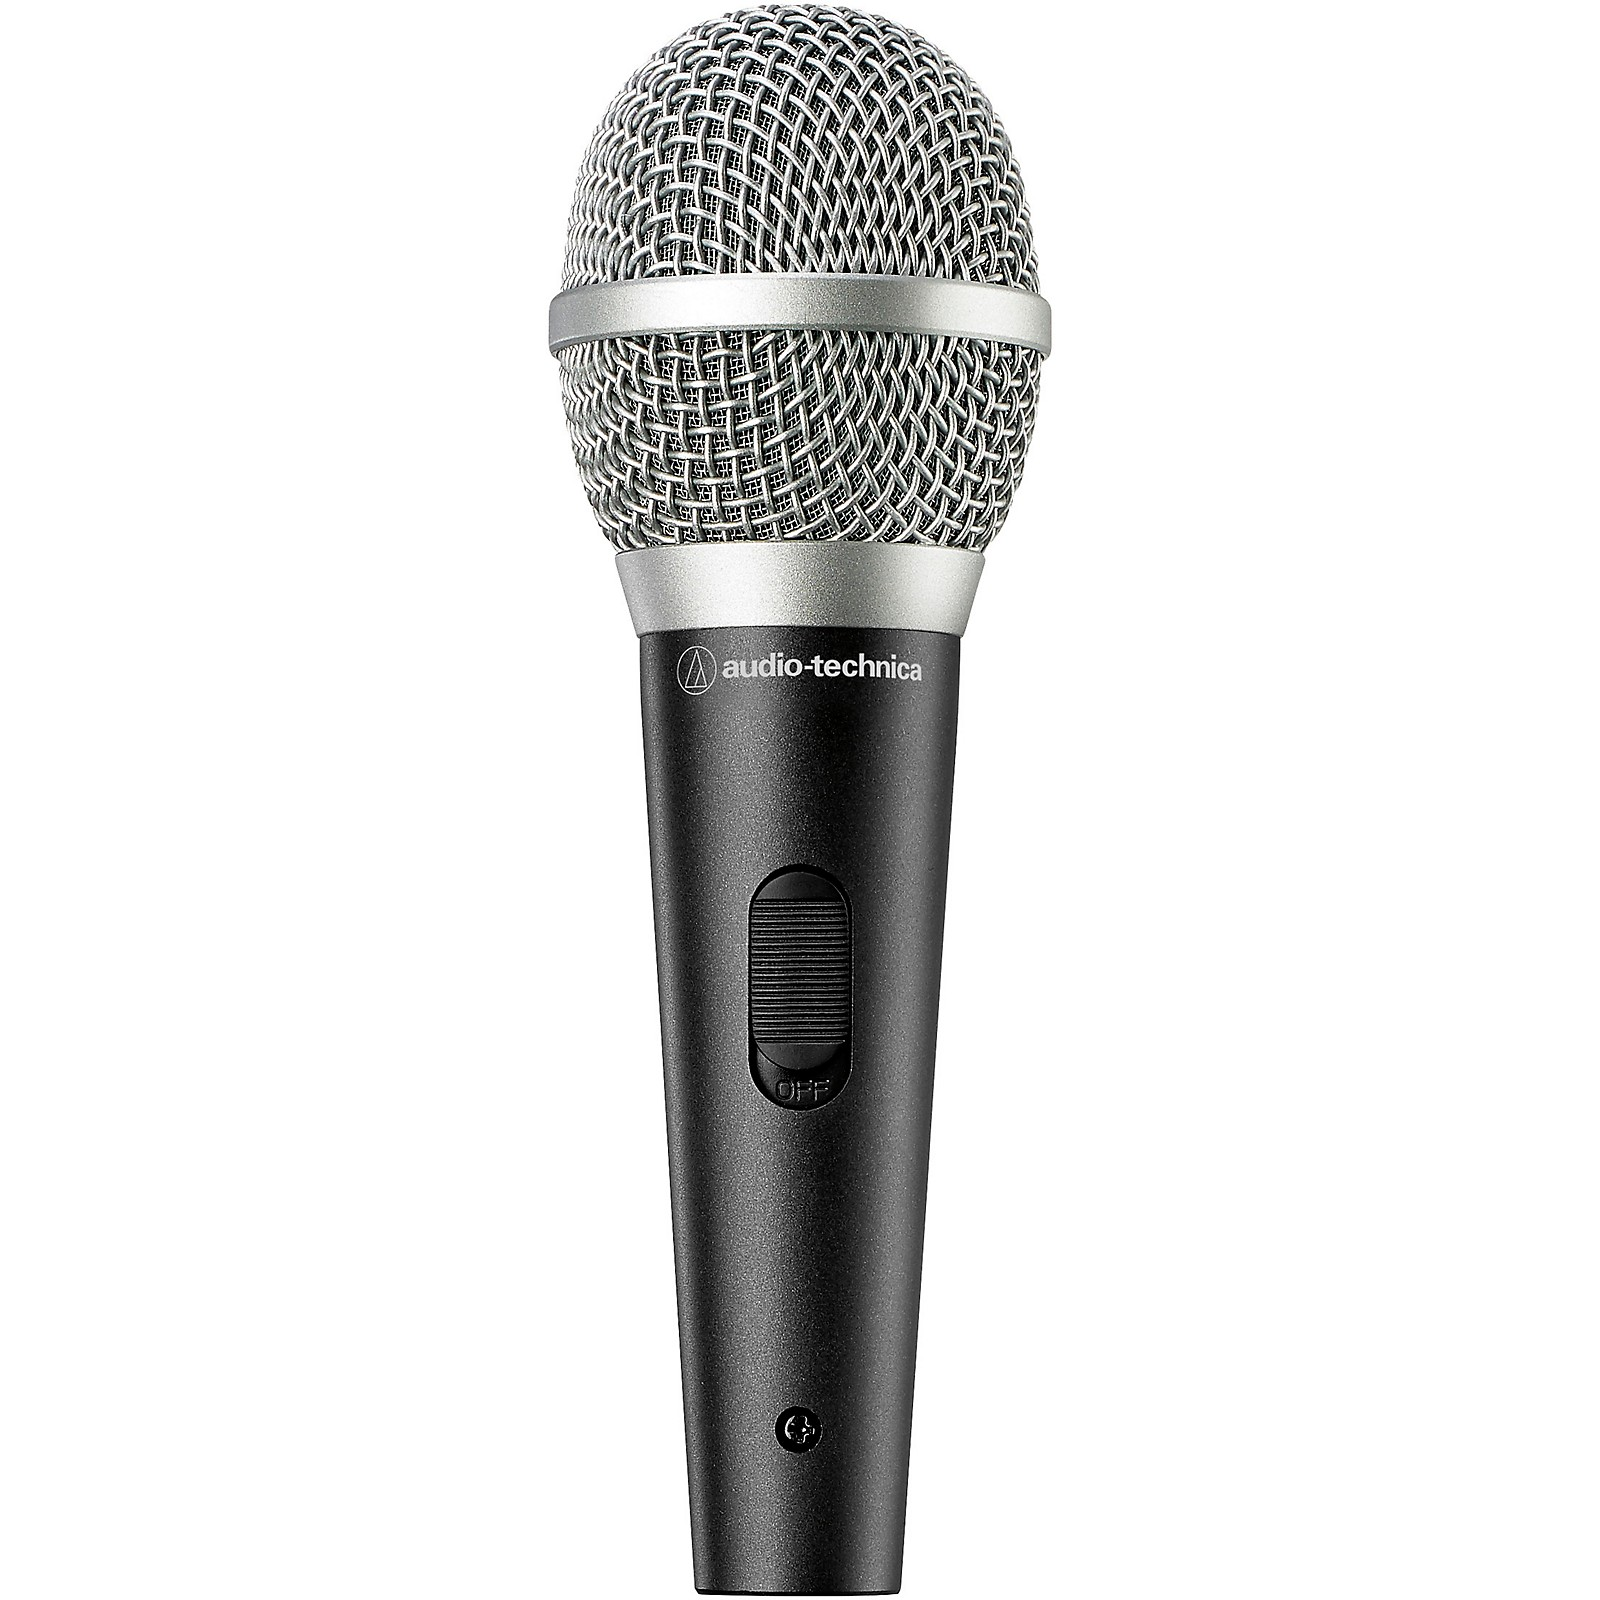 Audio-Technica ATR1500X Unidirectional Dynamic Vocal/Instrument Microphone